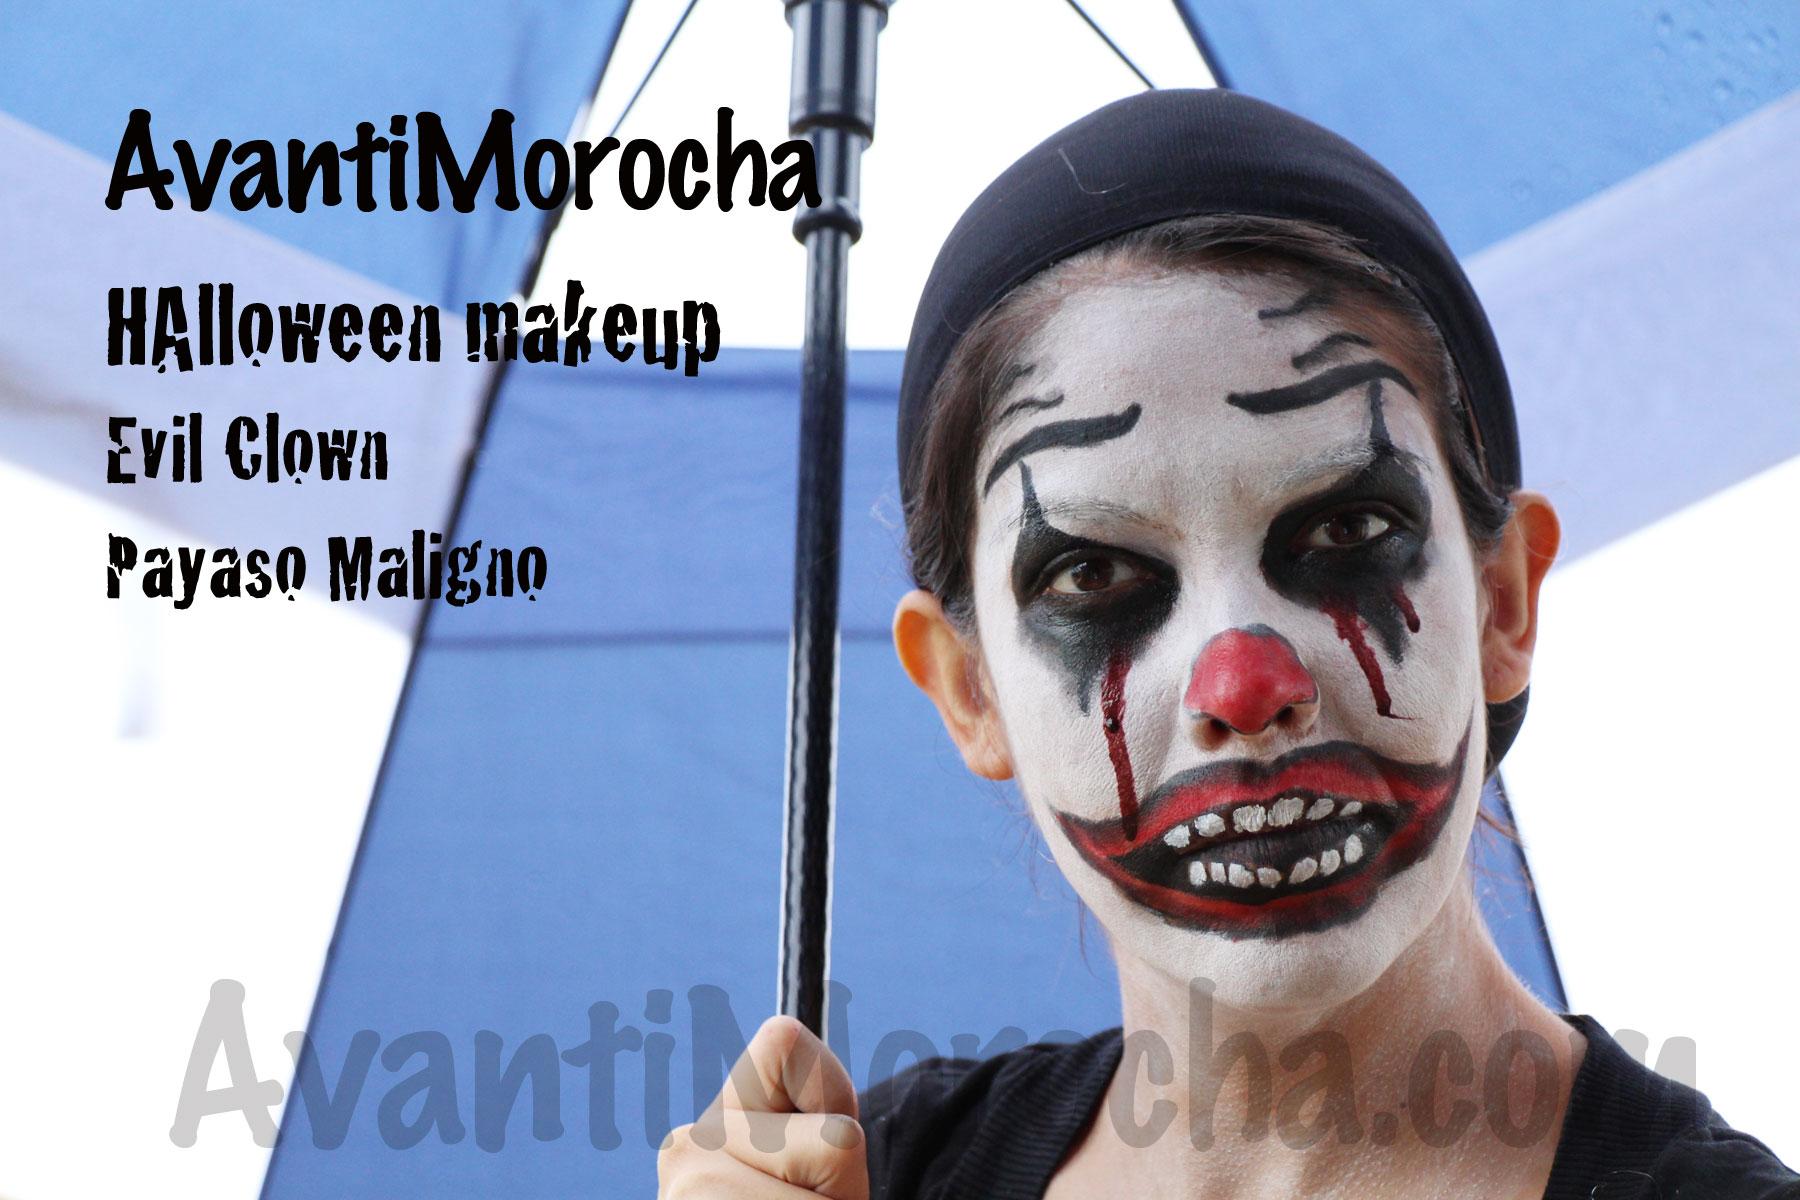 Evil Clown - Payaso Maligno